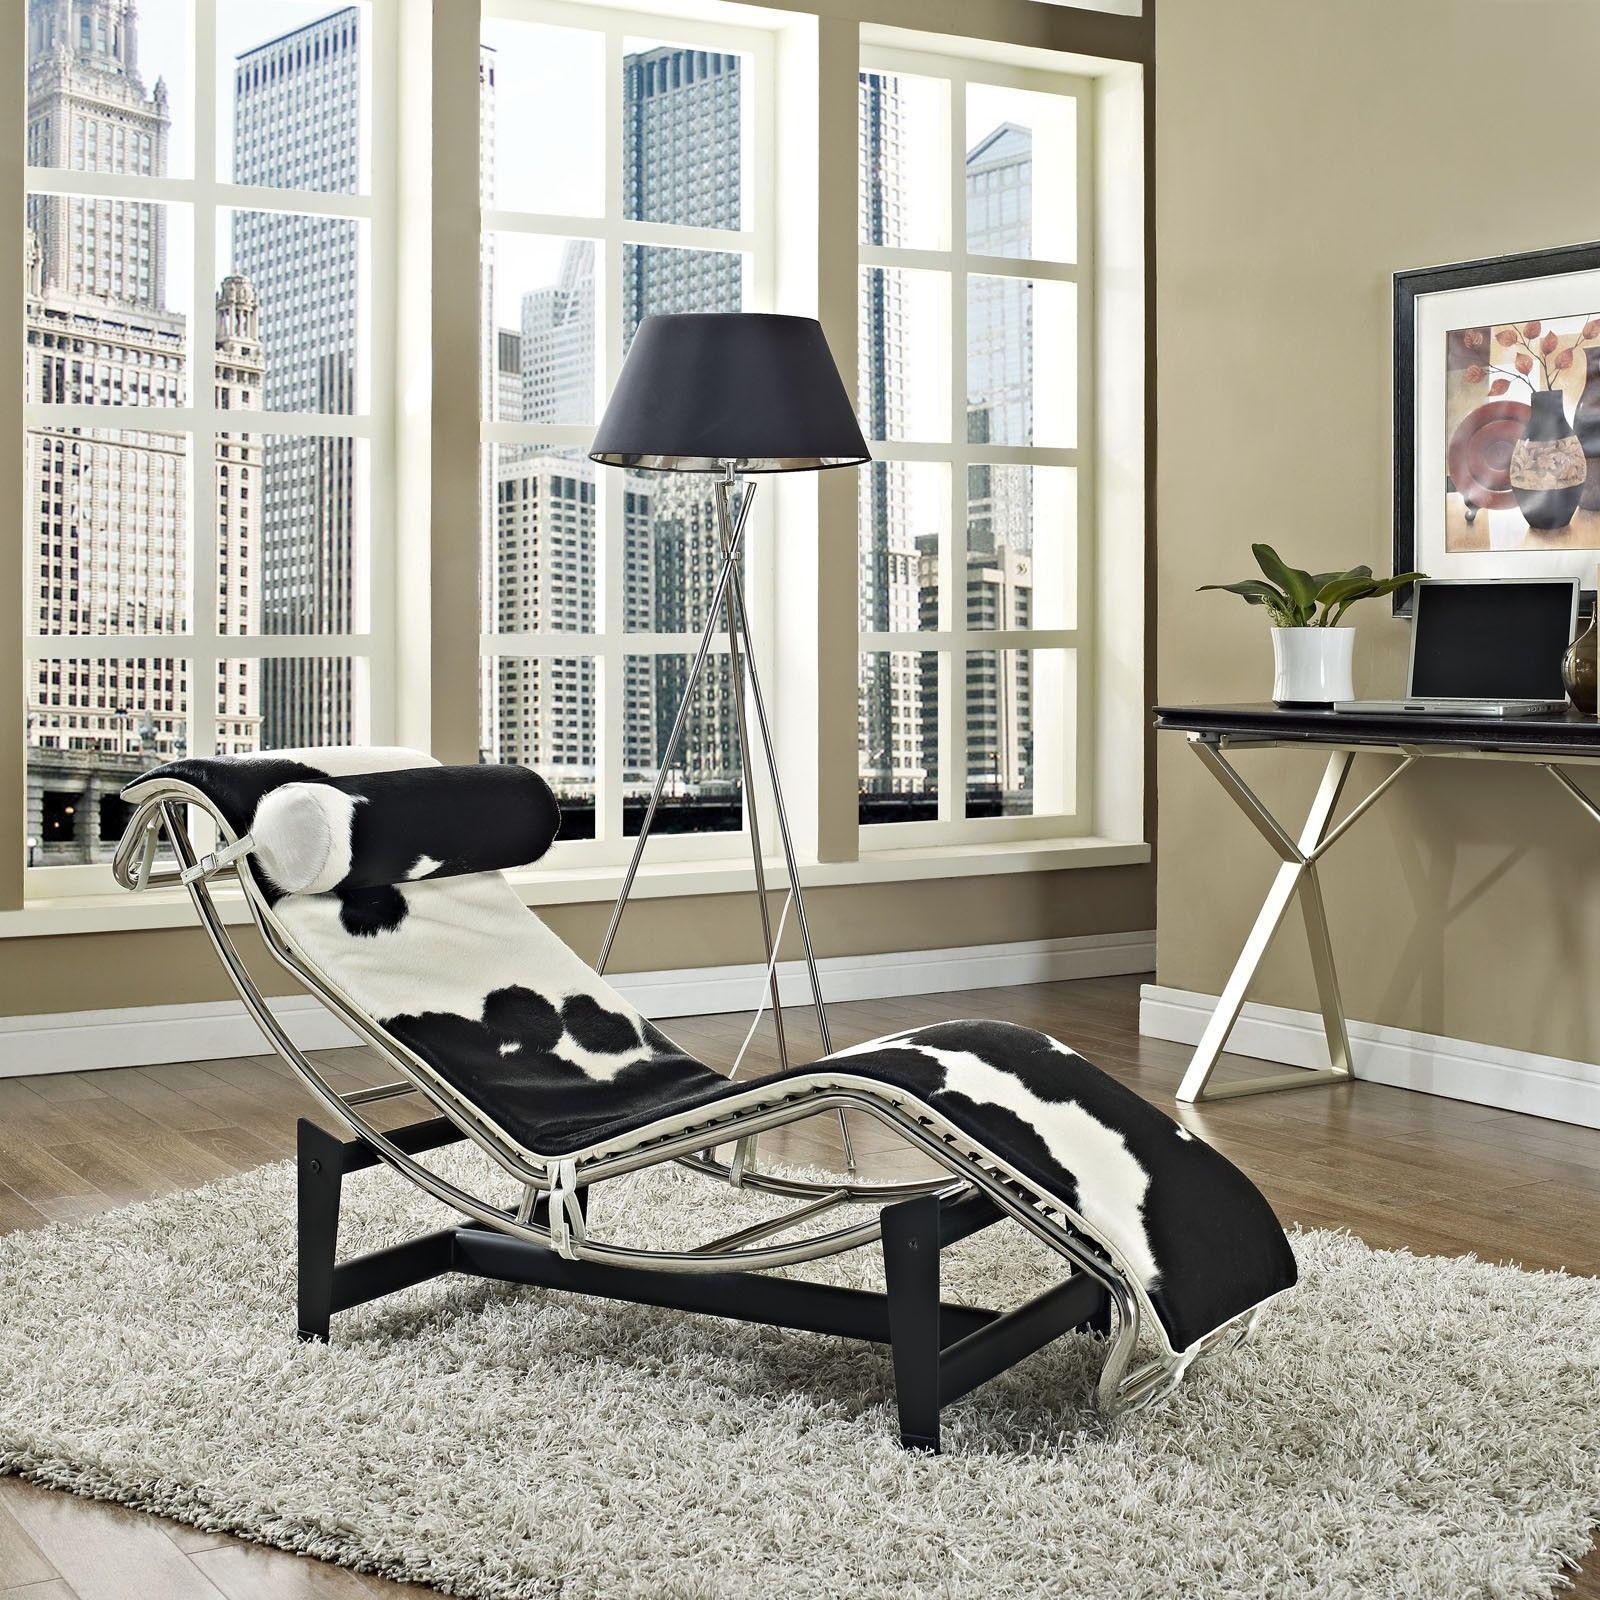 Le Corbusier - Liege LC4 Fell »« LC4 chaise lounge Pony pelt ...